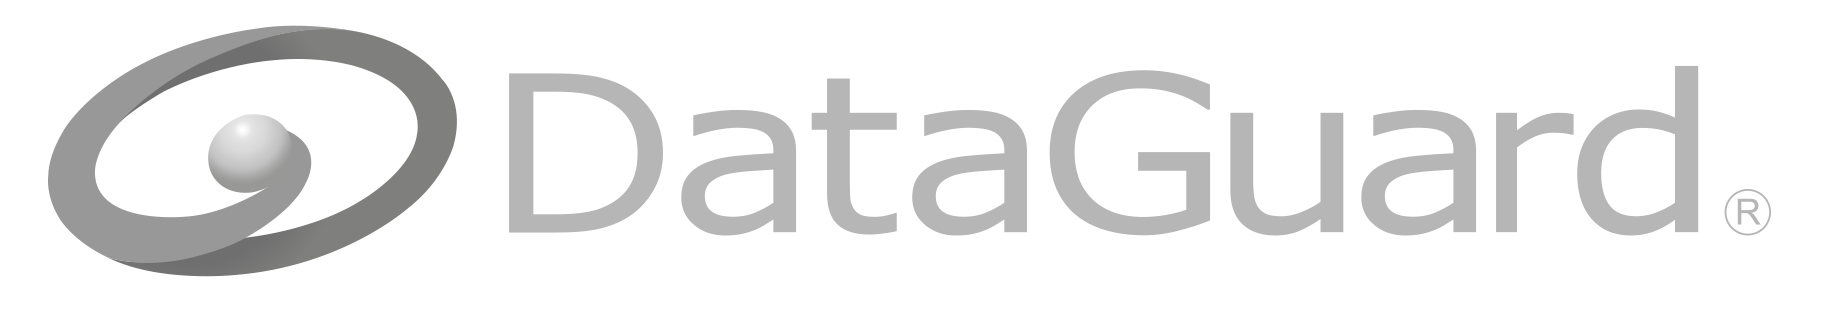 Dataguard Group